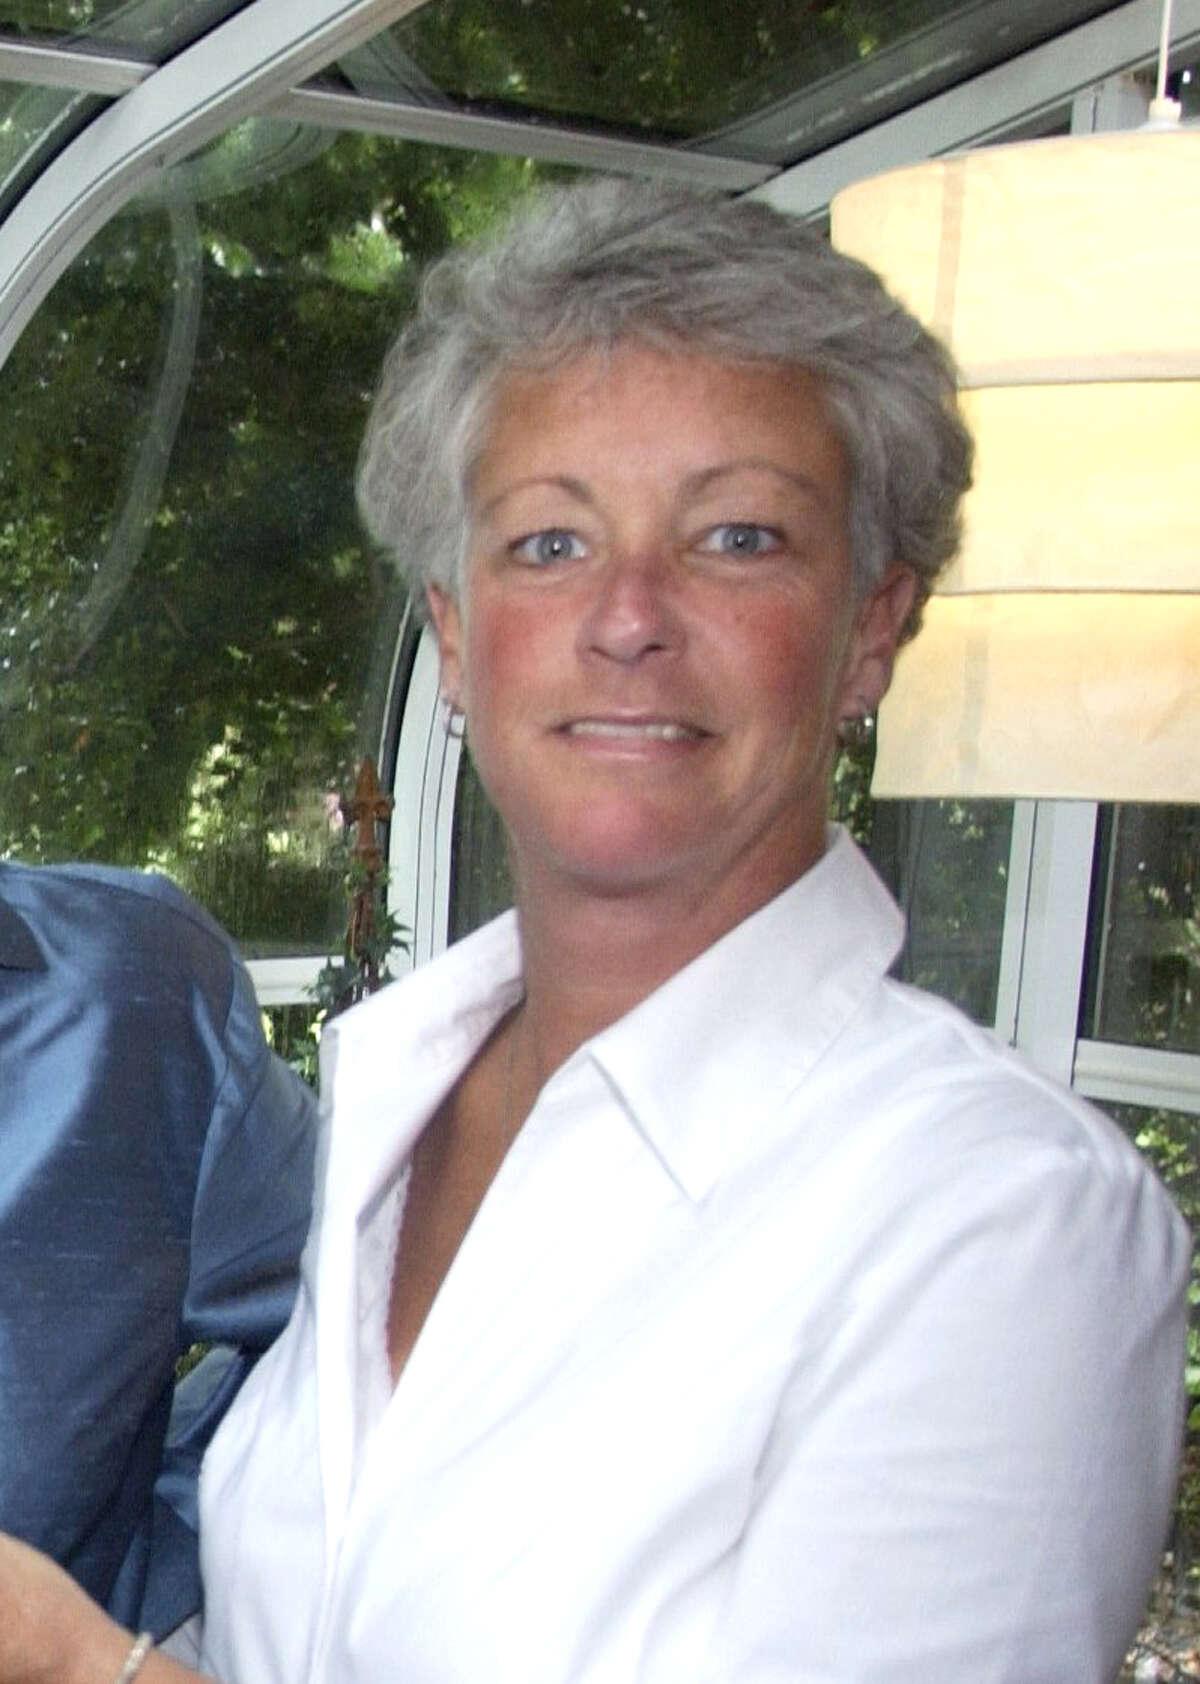 Nina Van Erk, Executive Director NYSPHSAA, Tuesday, September 3, 2003. (Newsday Photo/Karen Wiles Stabile)